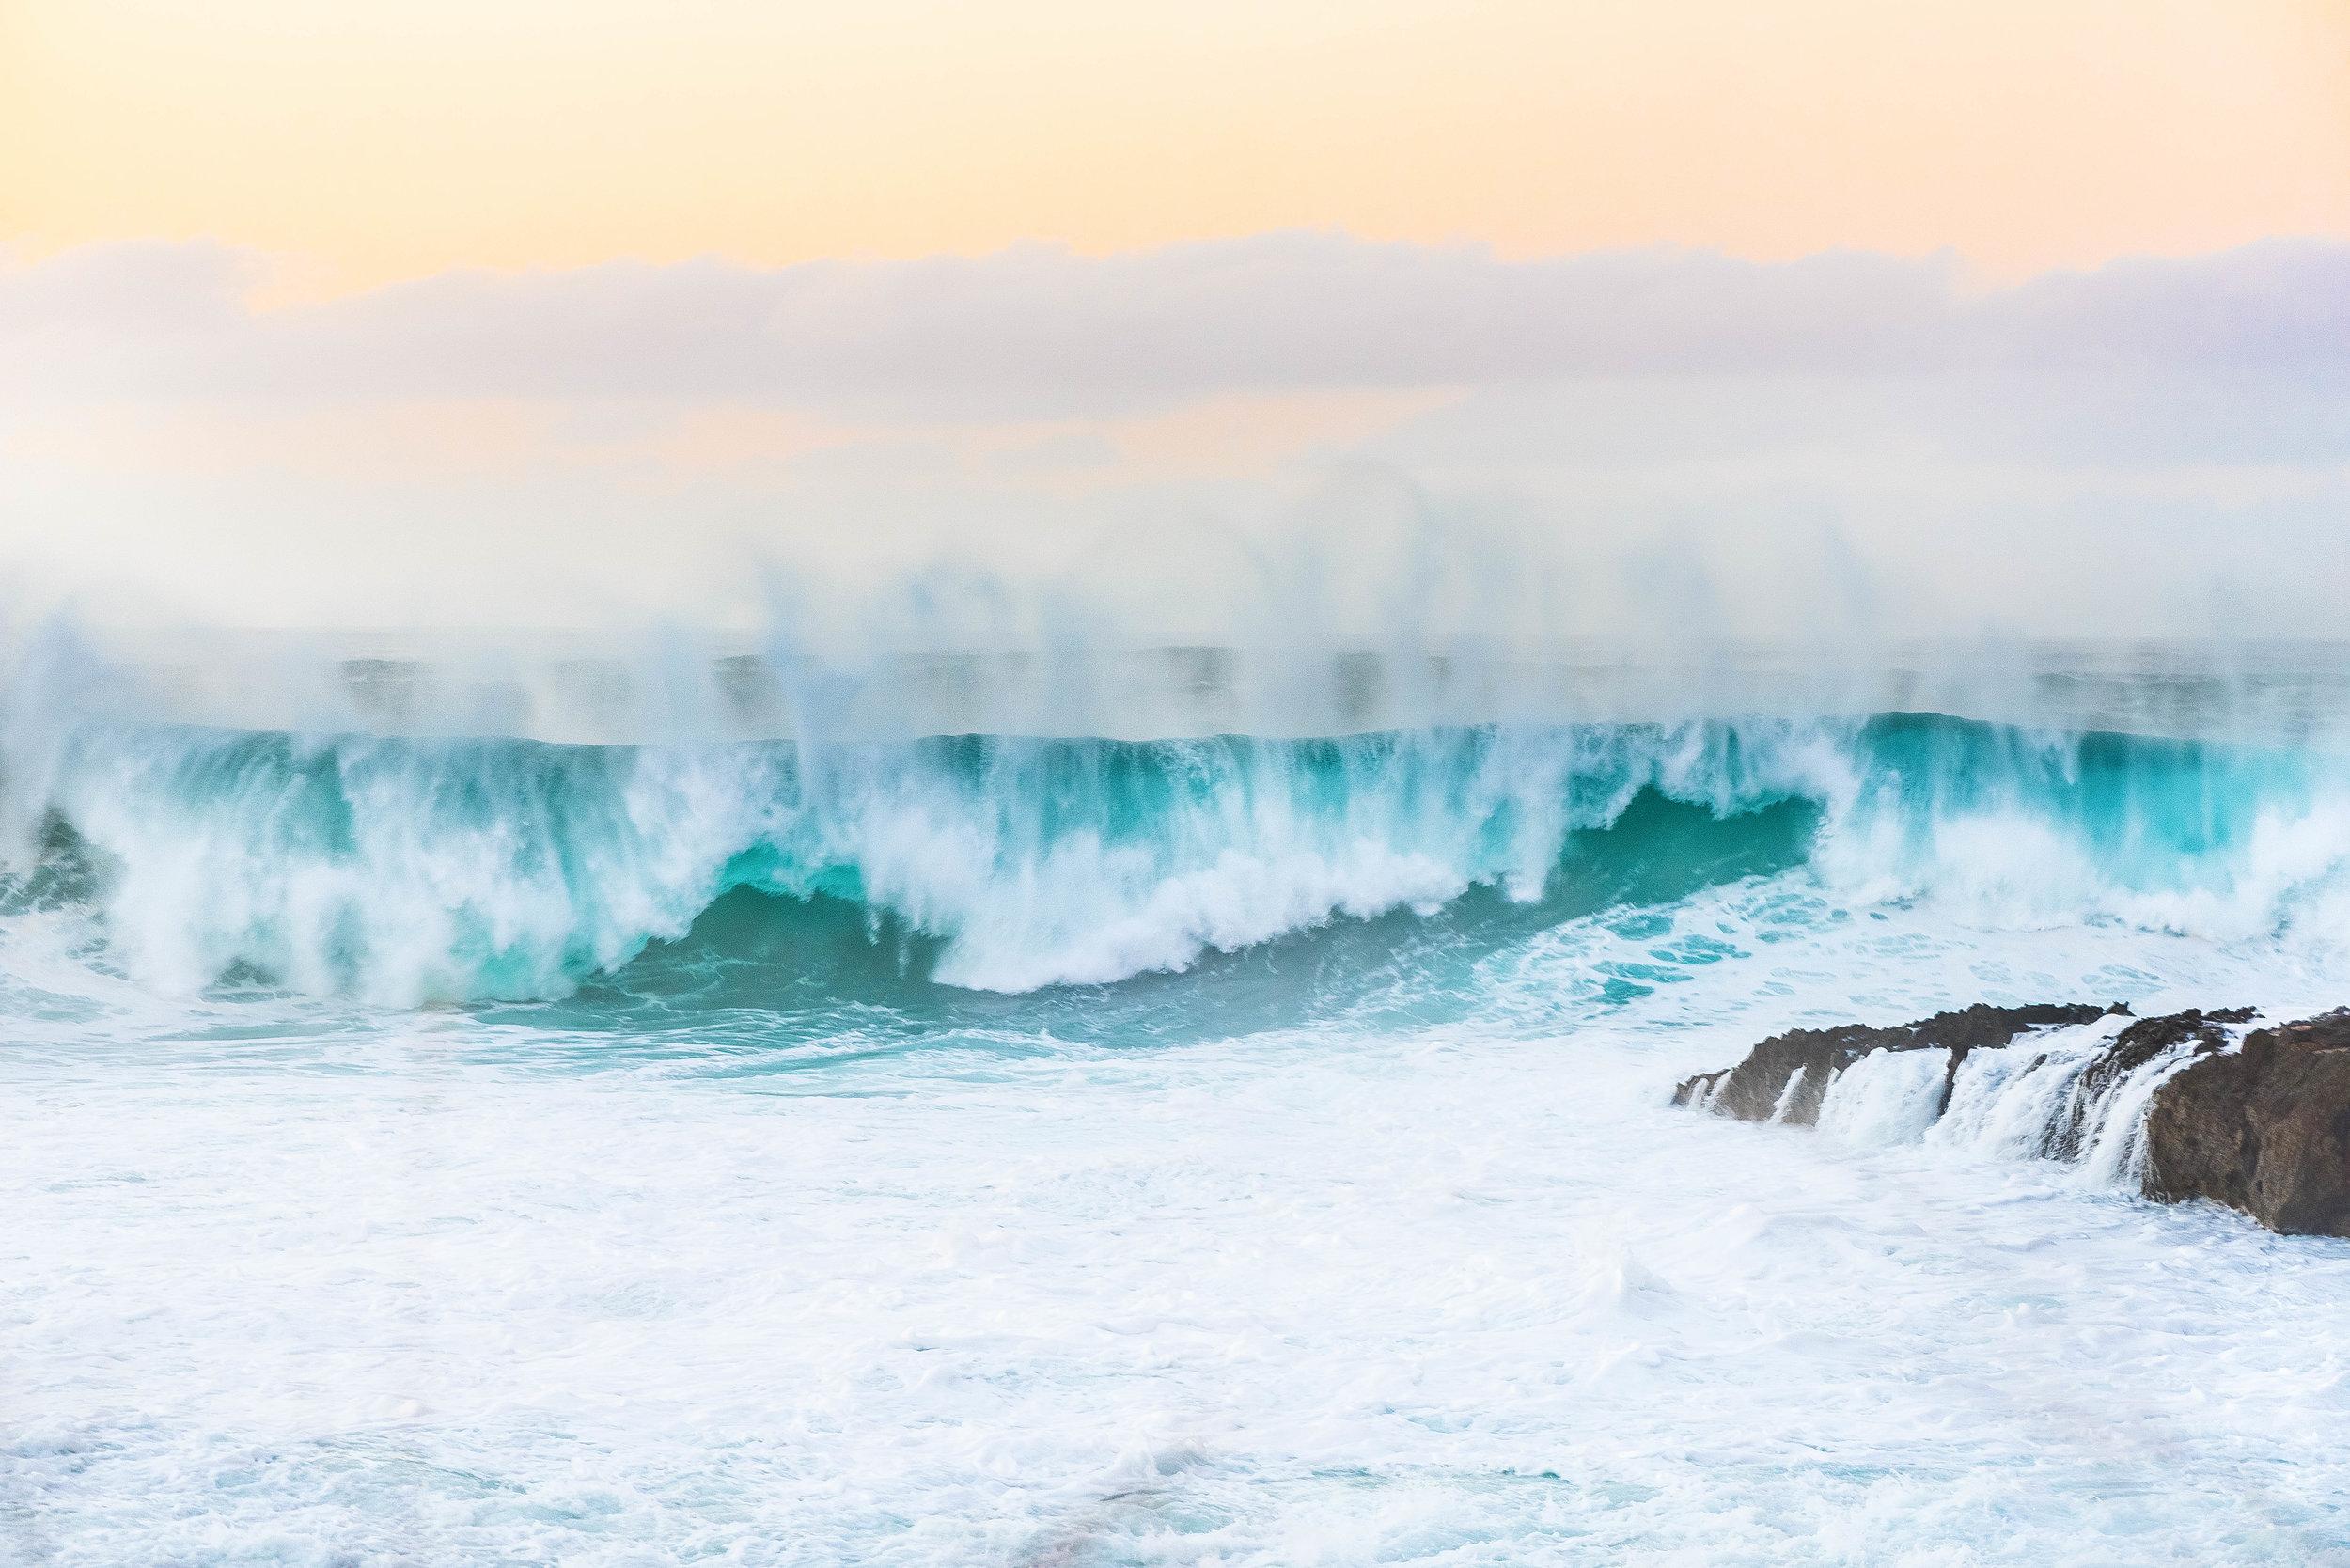 Sharks Cove, North Shore, Oahu - Big Wave Day 2016